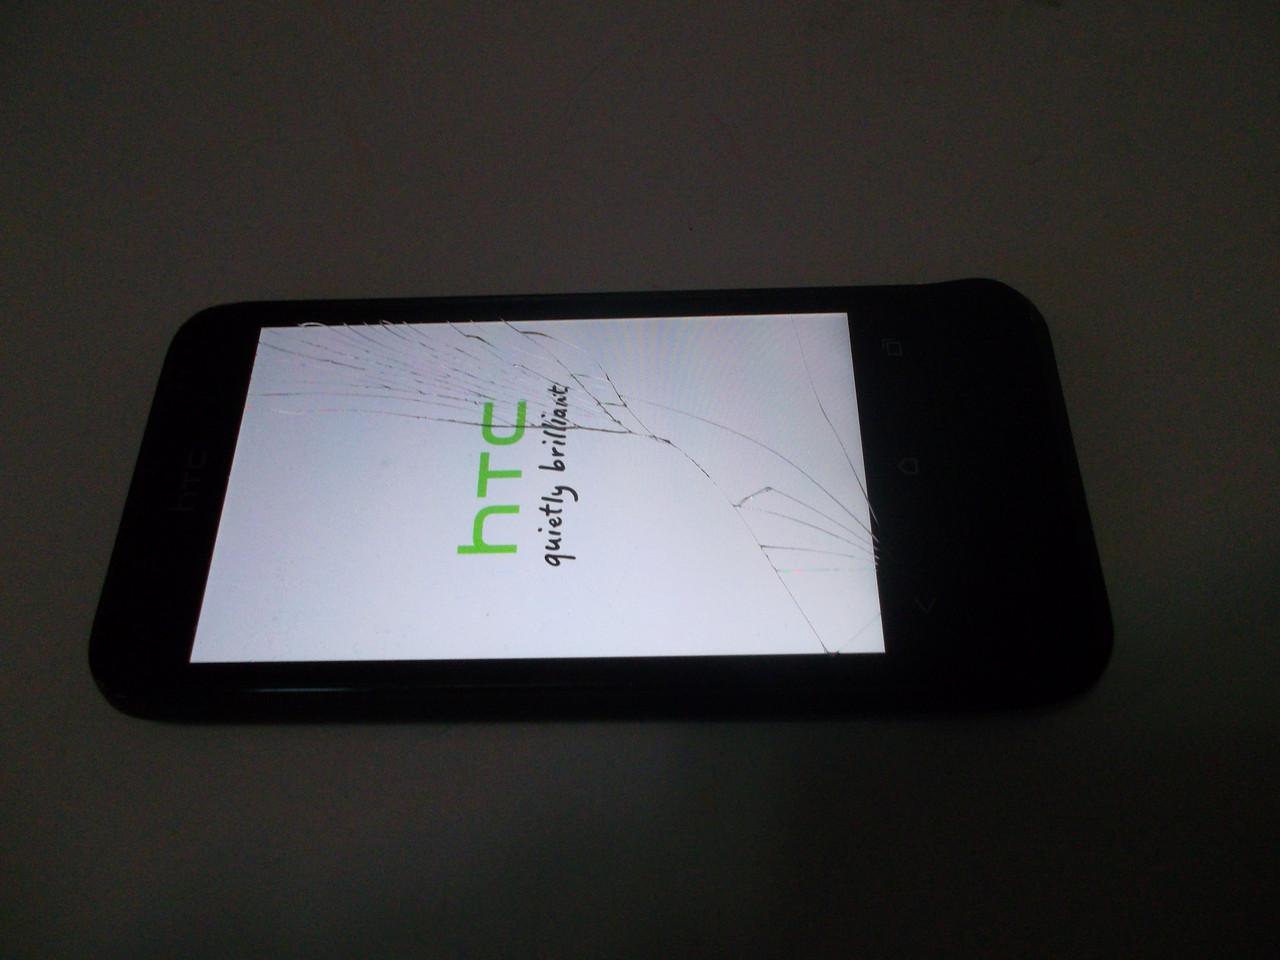 HTC ONE V #972